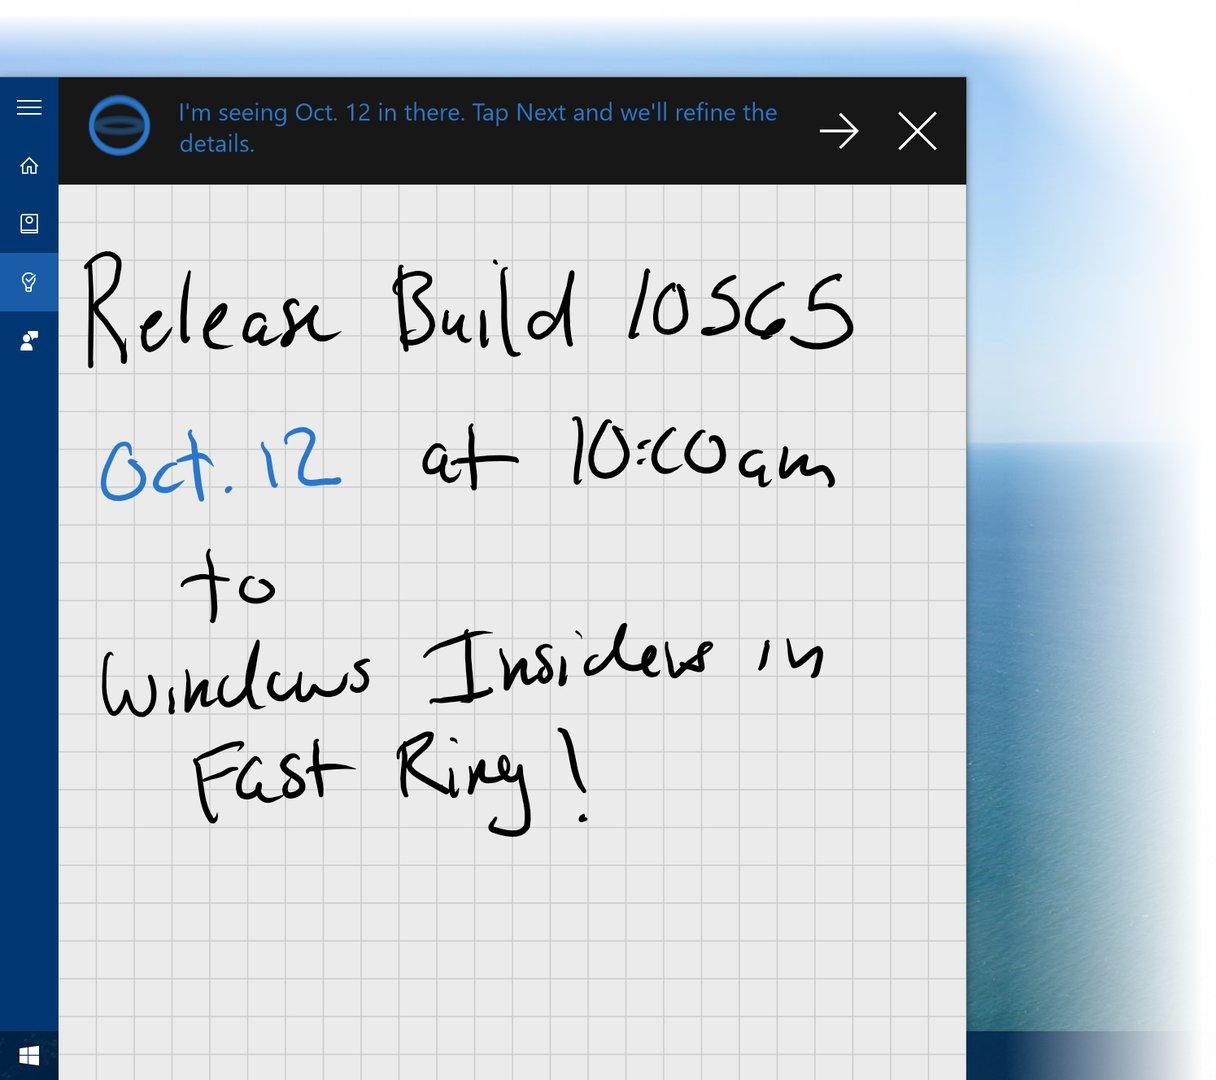 Cortana erkennt jetzt Handschrift